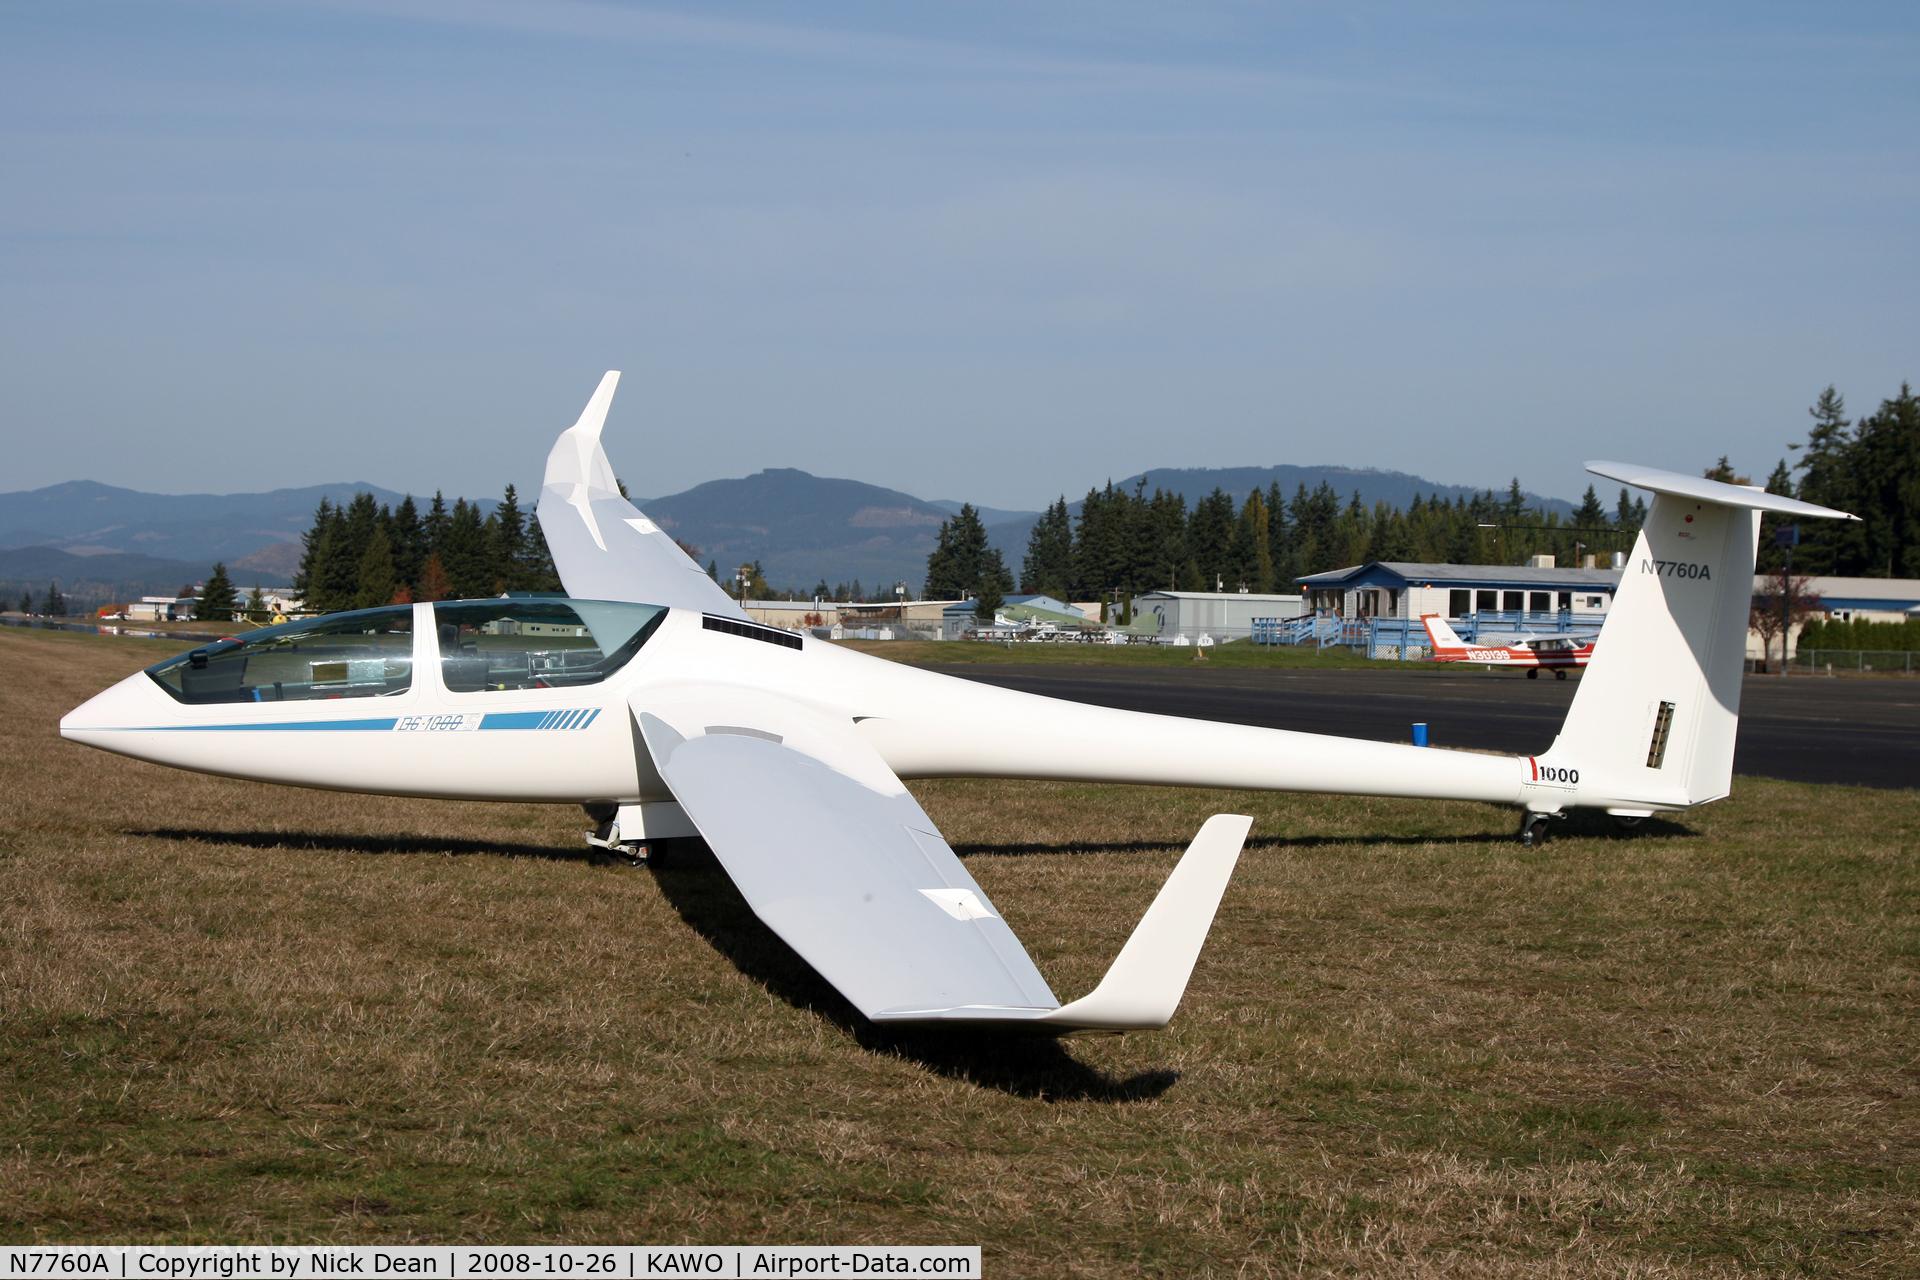 N7760A, 2003 DG Flugzeugbau DG-1000S C/N 10-34S33, /